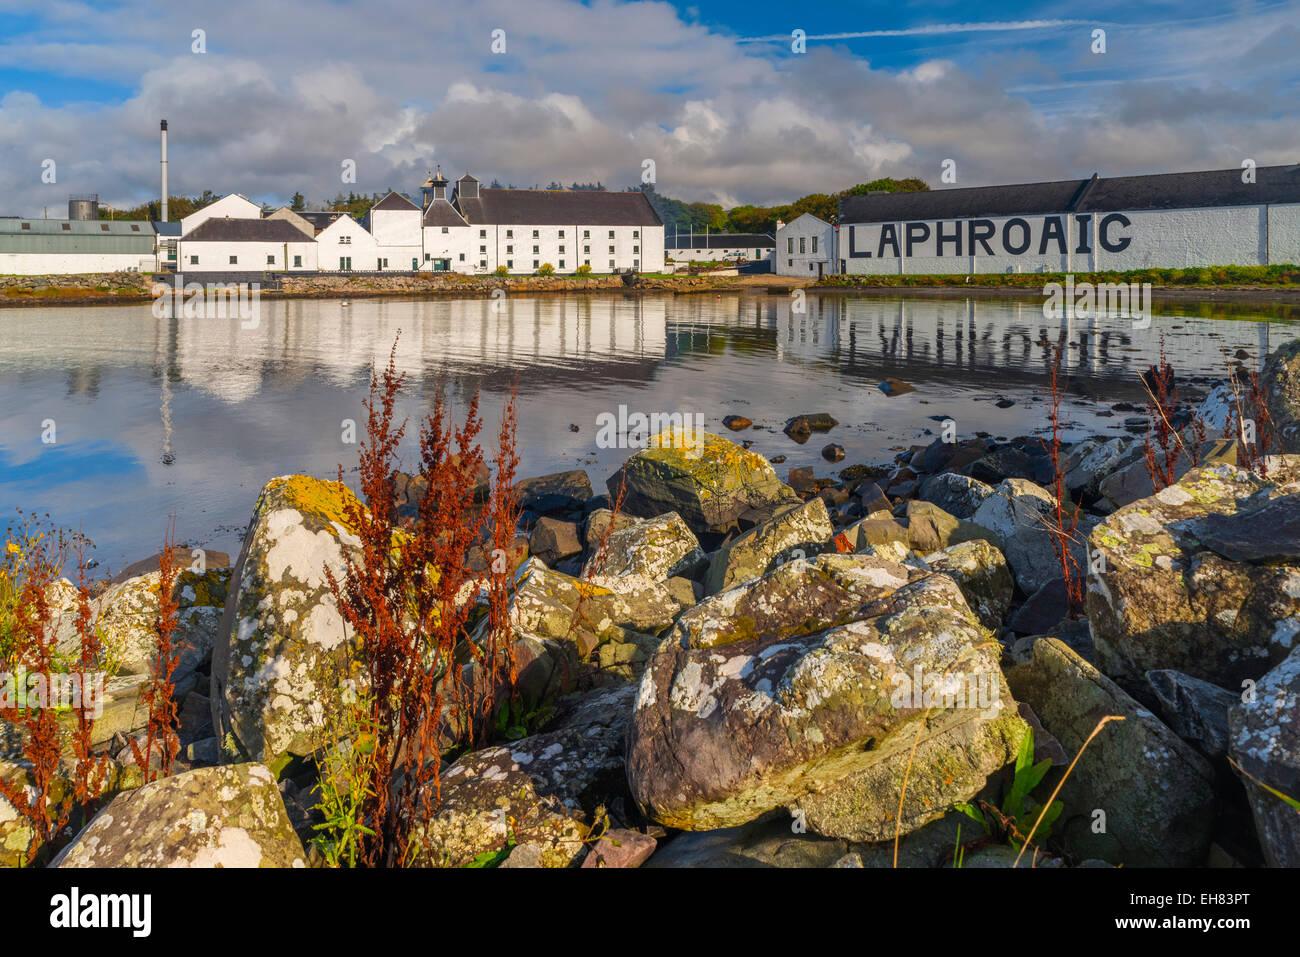 Laphroaig Whisky Distillery, Loch Laphroaig, Islay, Argyll and Bute, Scotland, United Kingdom, Europe - Stock Image